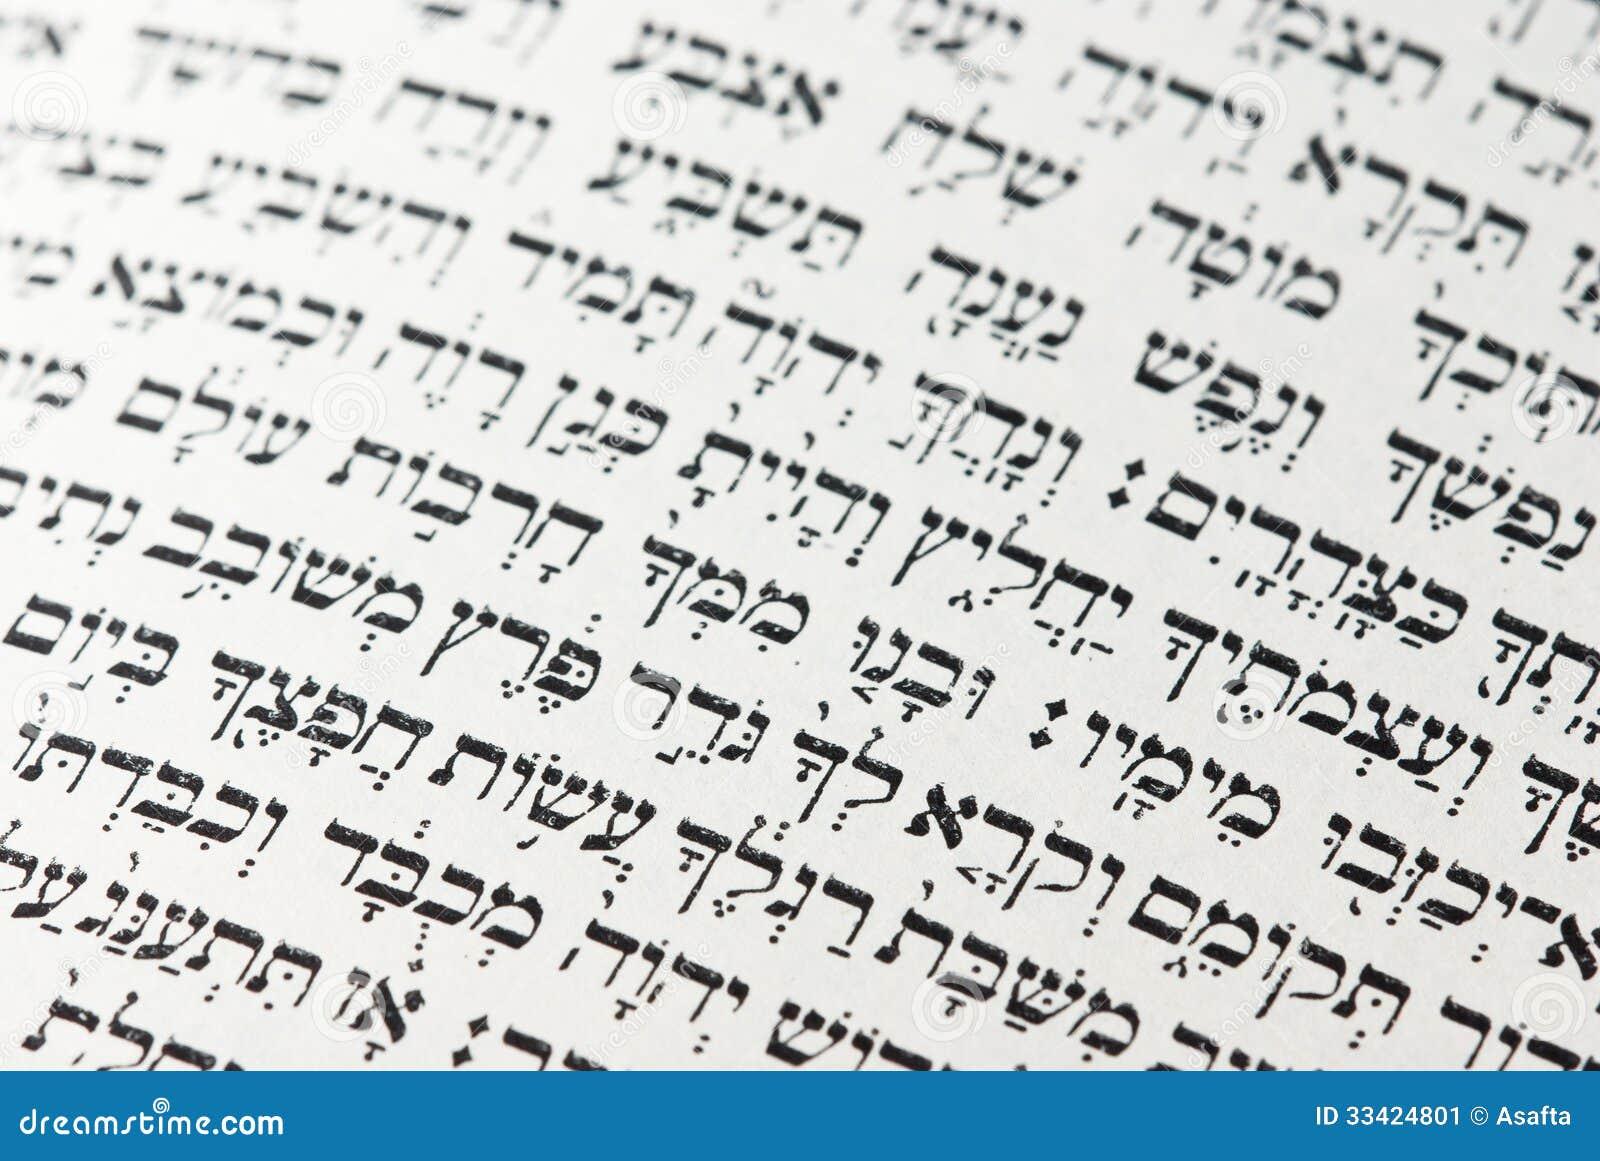 Texte hébreu